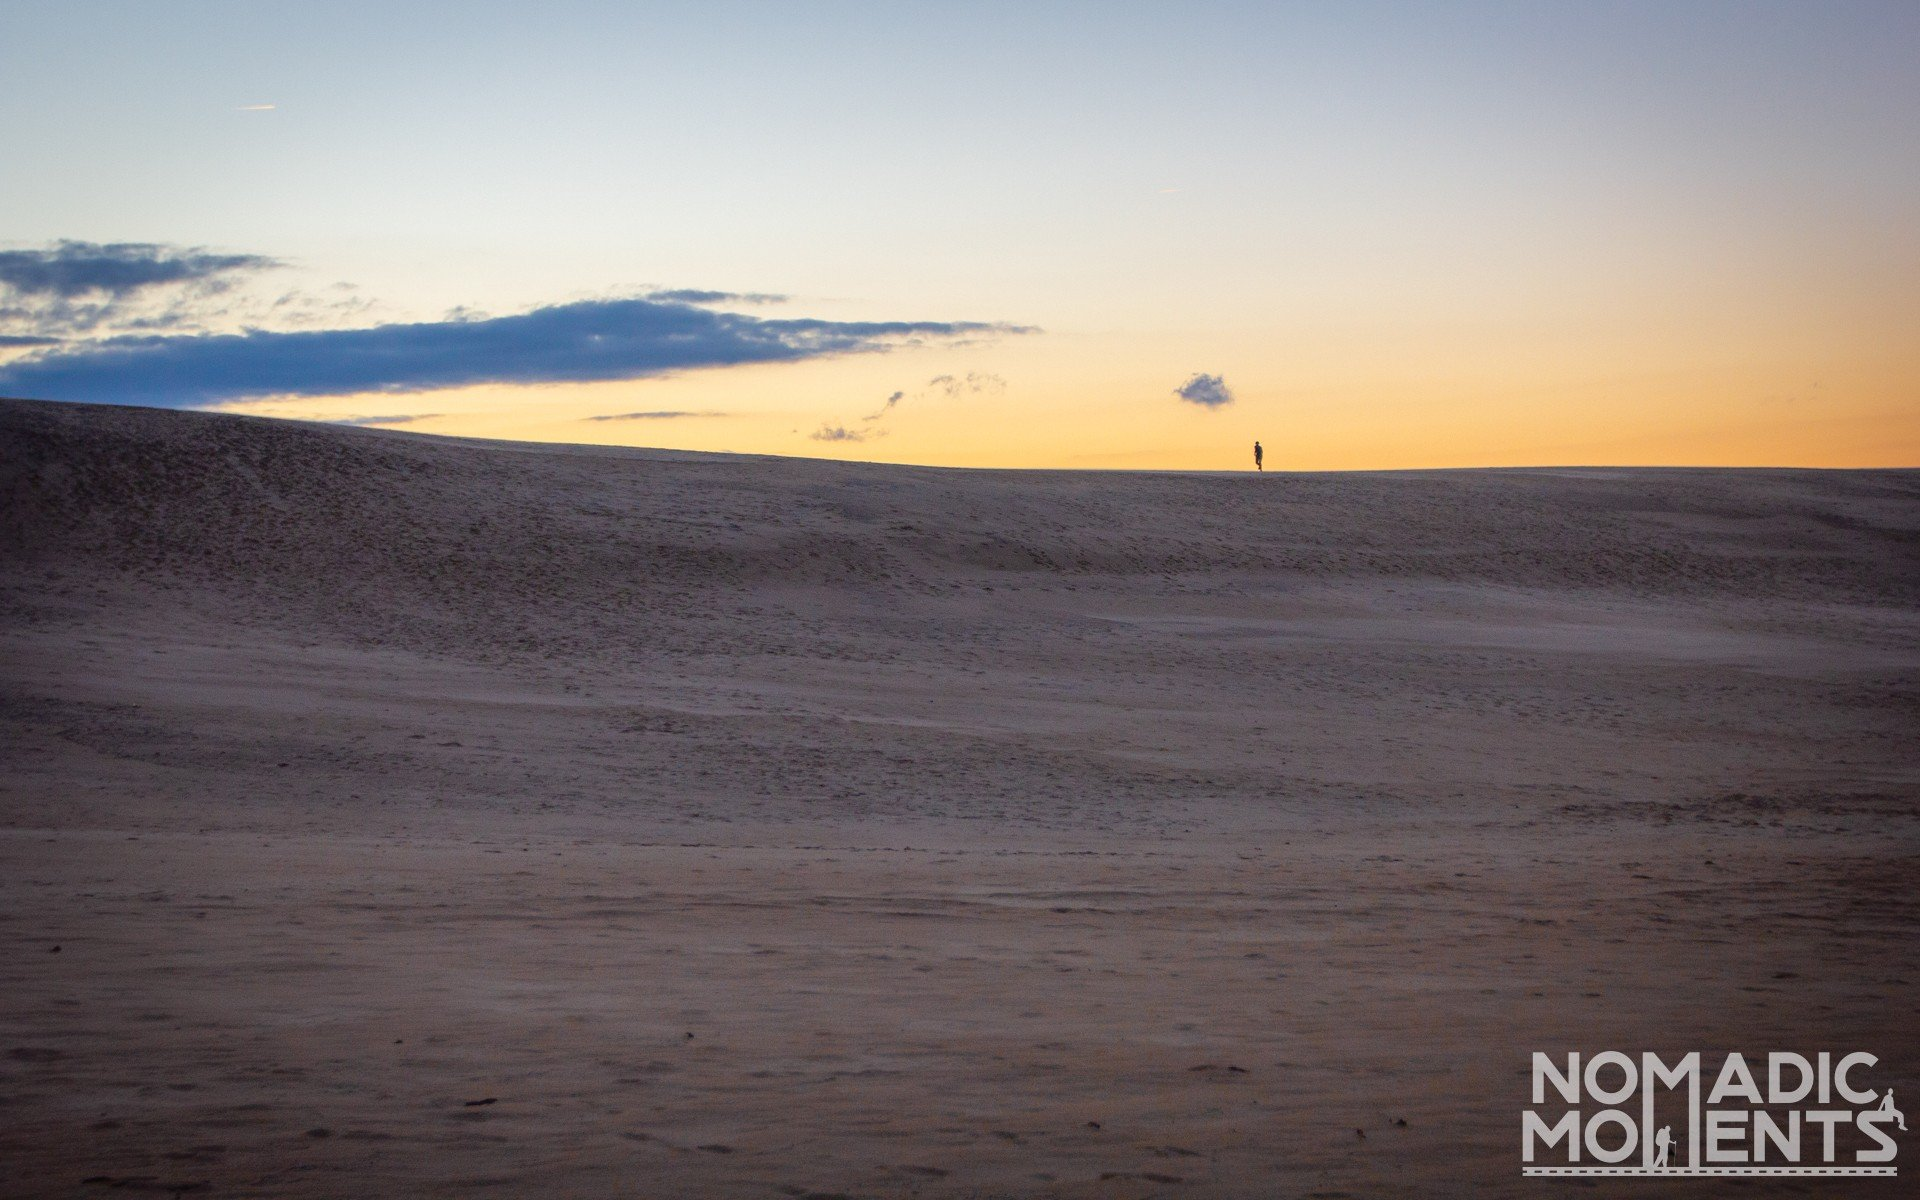 Jockey's Ridge sand dune - Visiting the Outer Banks